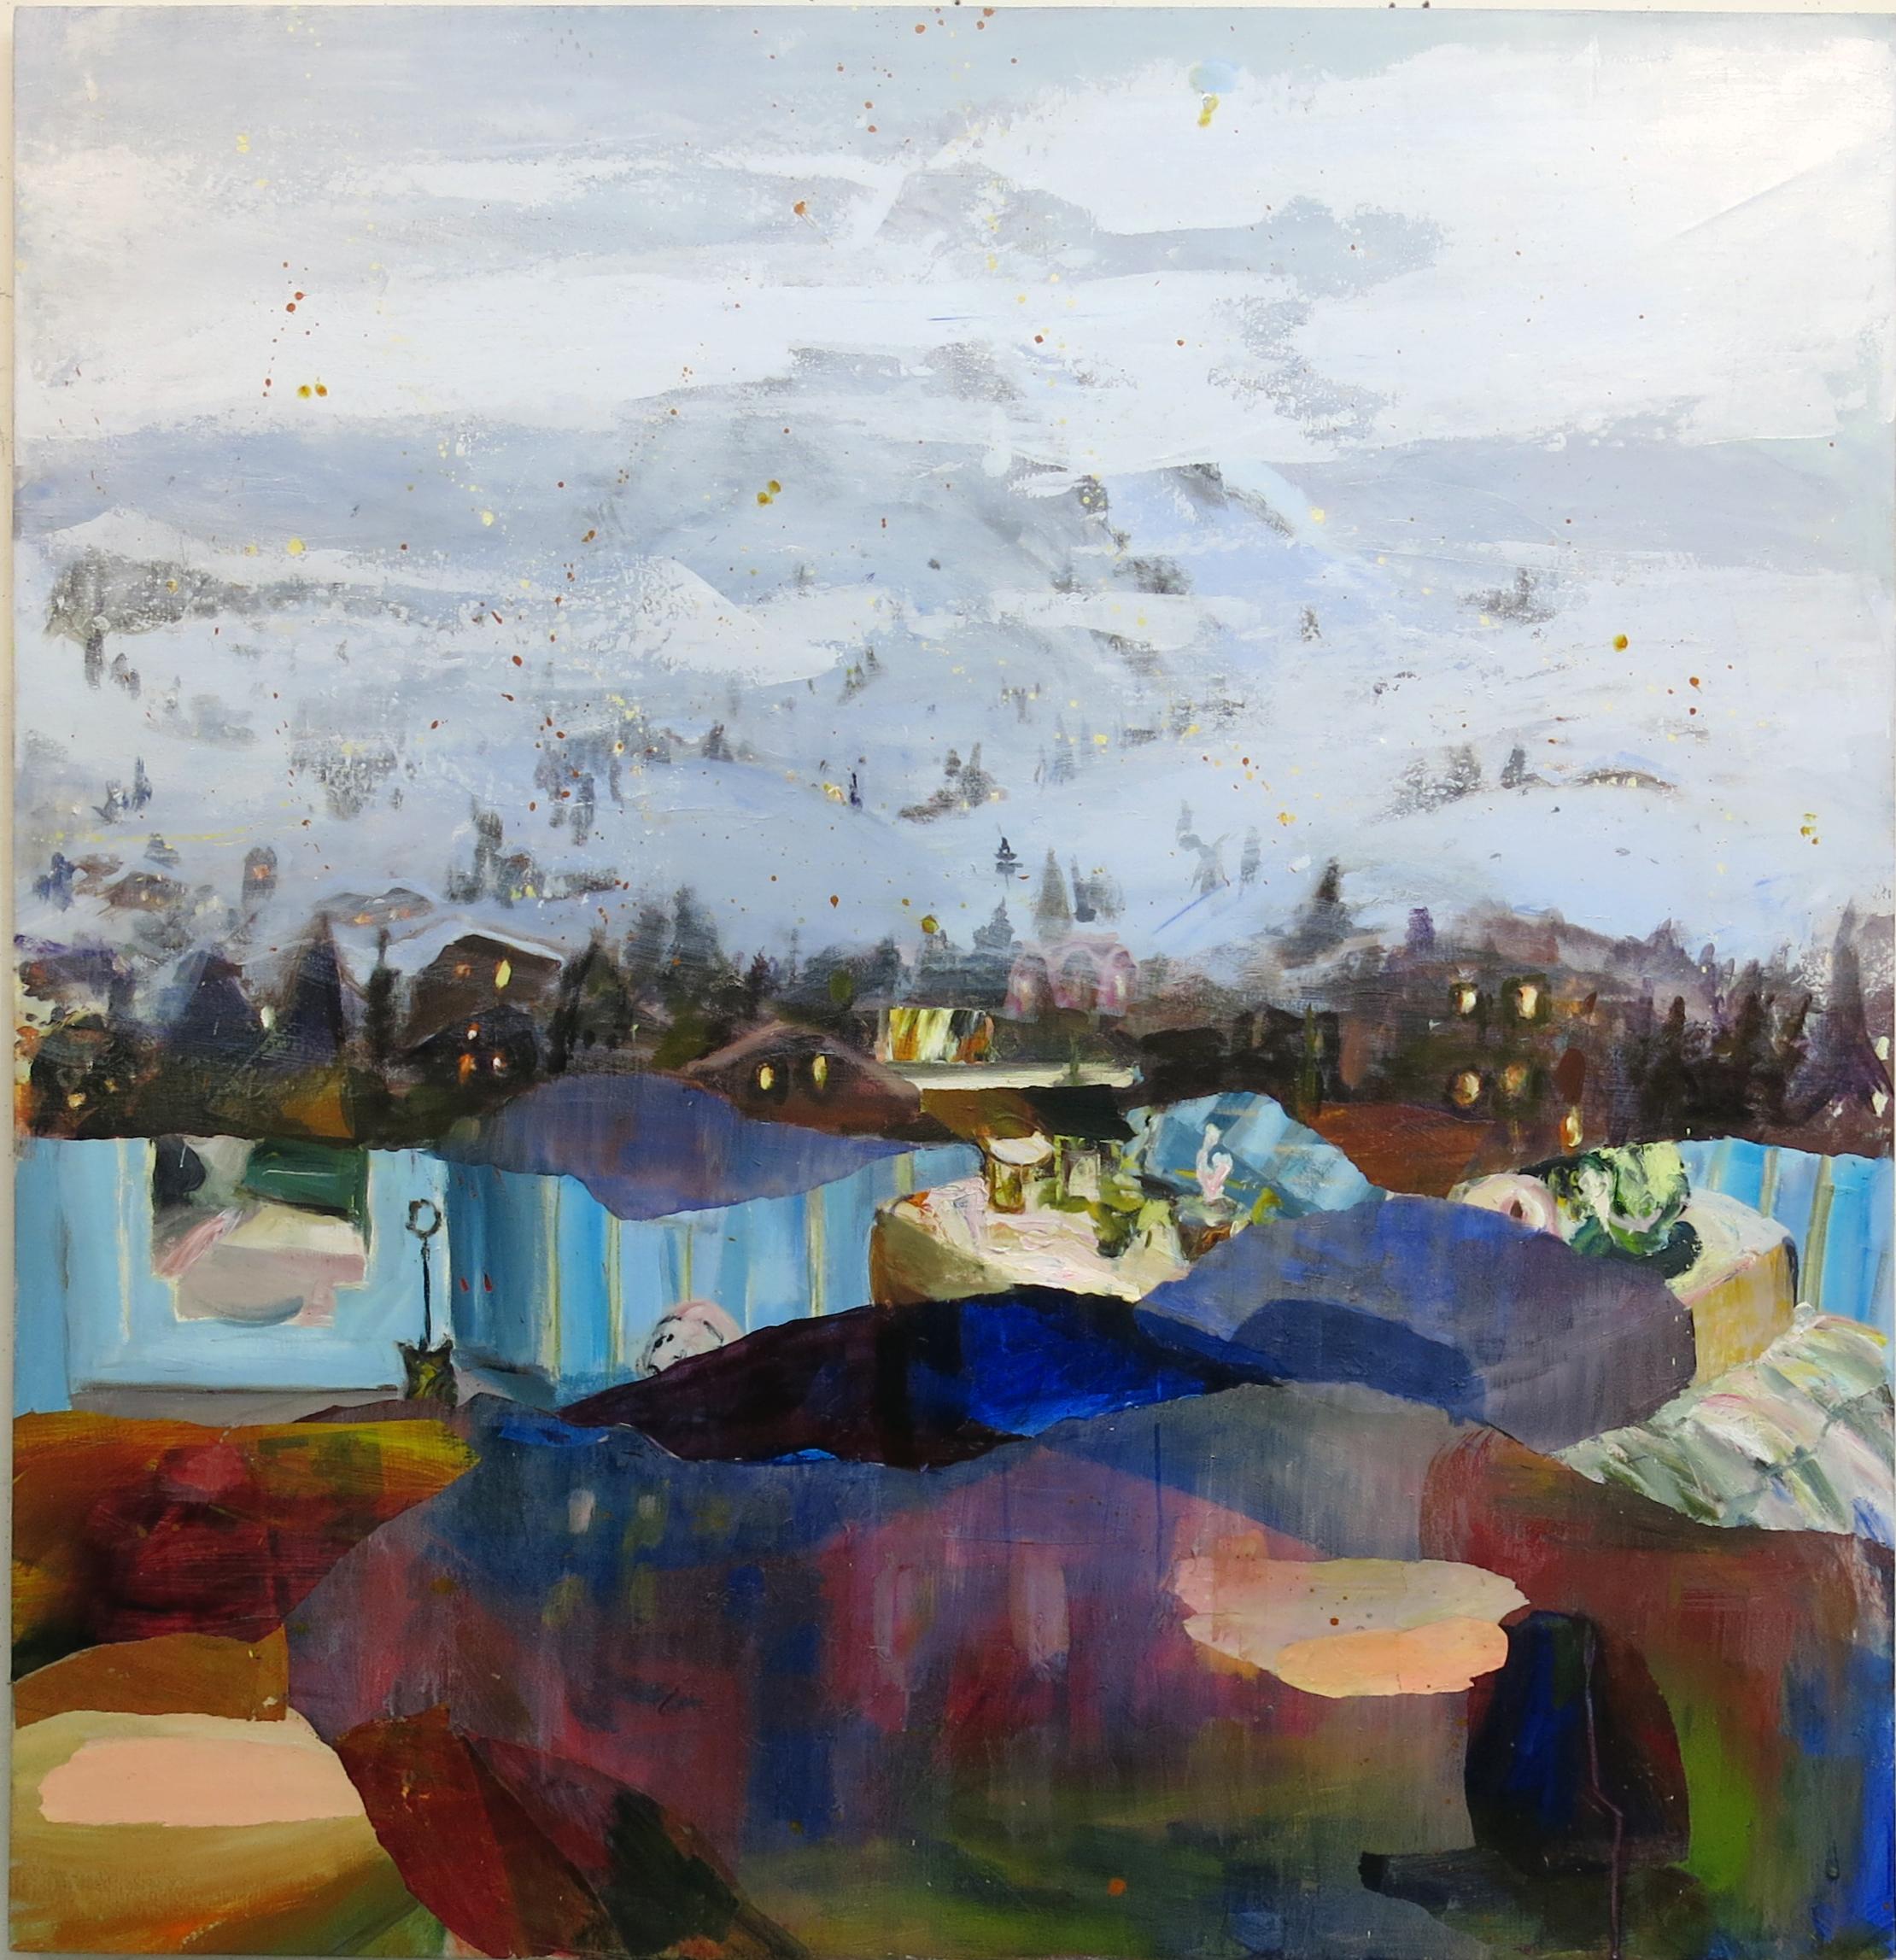 Judith Simonian, Winter Resort, 2015, acrylic on canvas, 60h x 58w in.